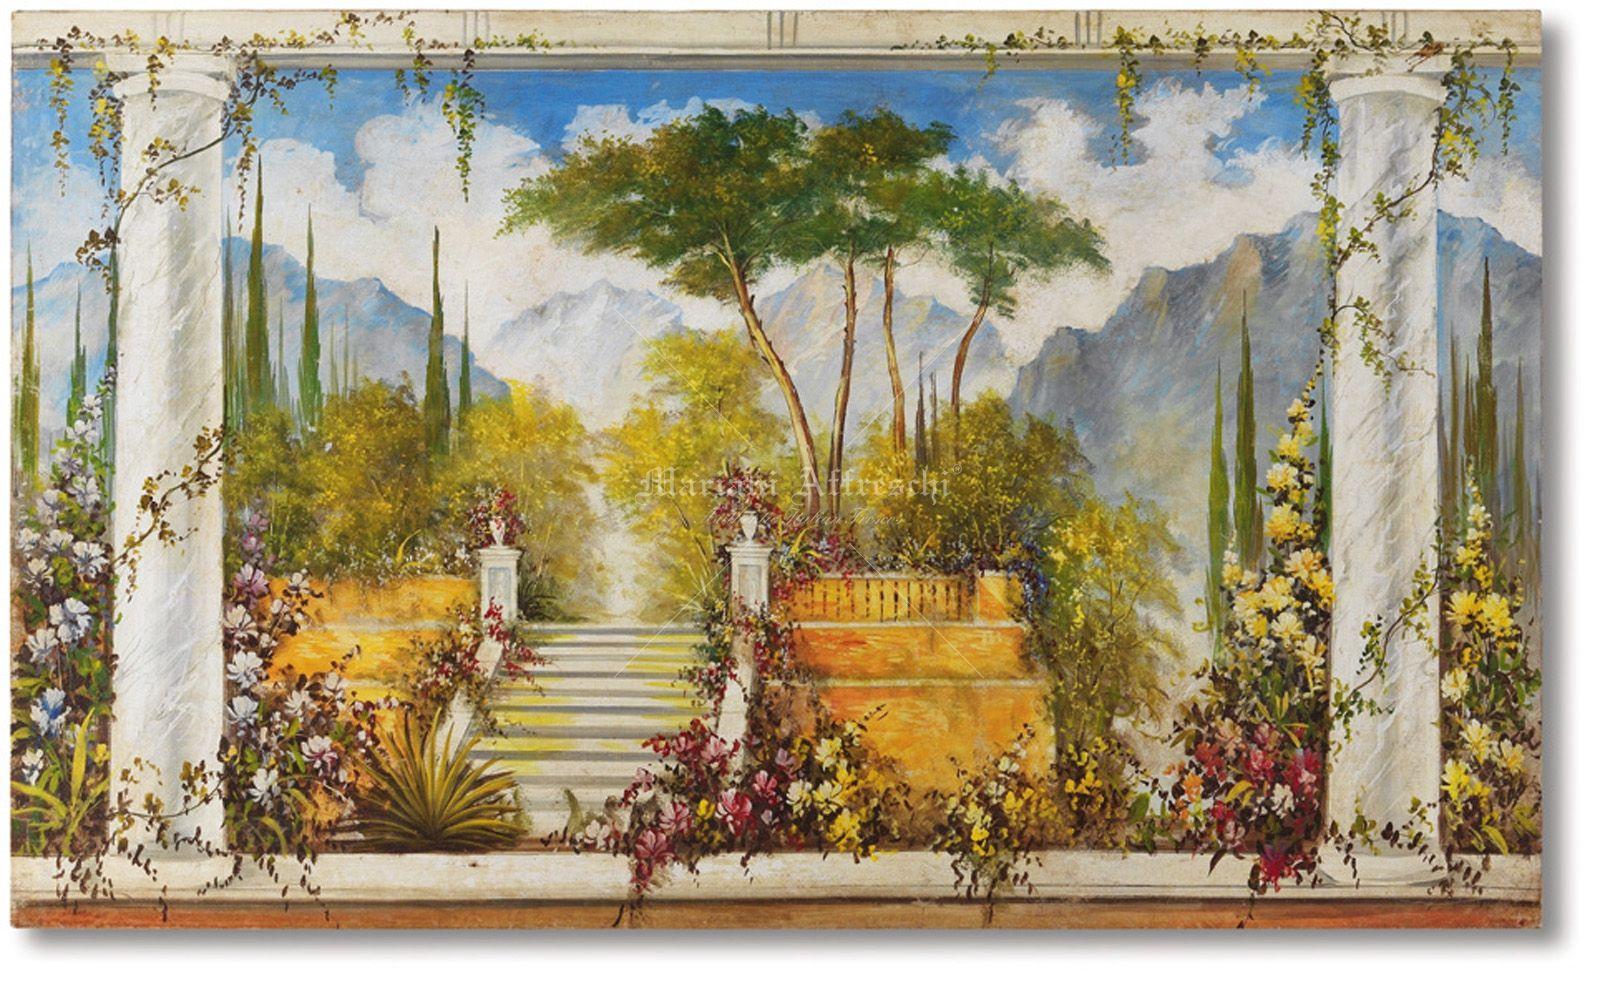 mariani affreschi landscapes and trompe l oeil. Black Bedroom Furniture Sets. Home Design Ideas